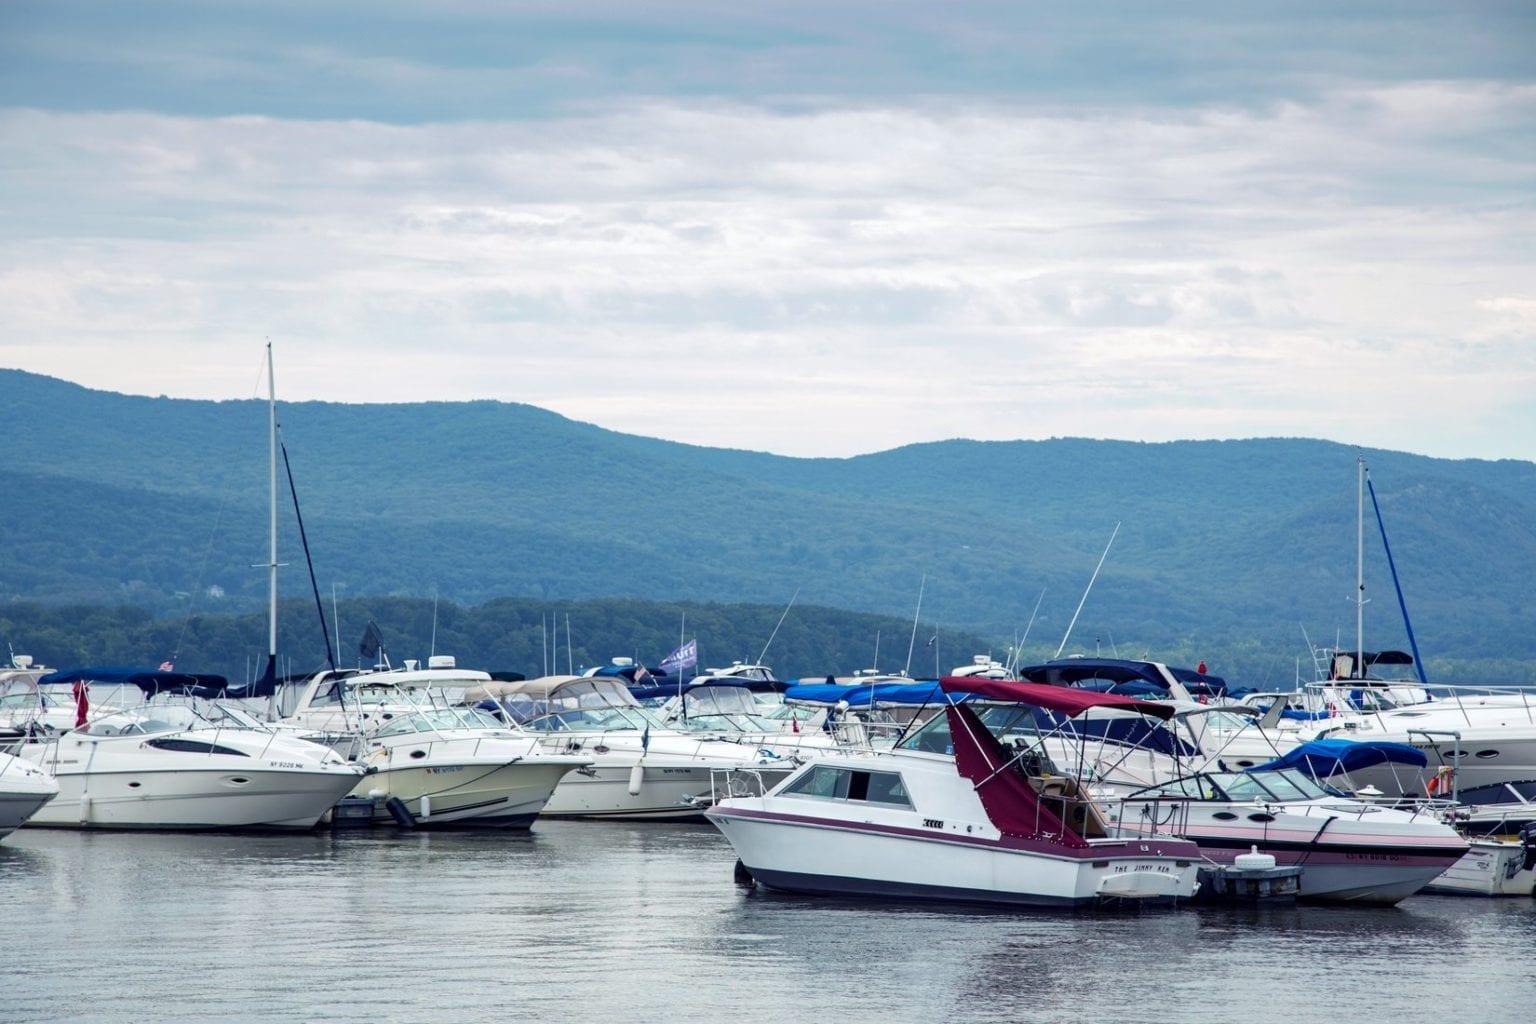 Marinas Boat & Launches